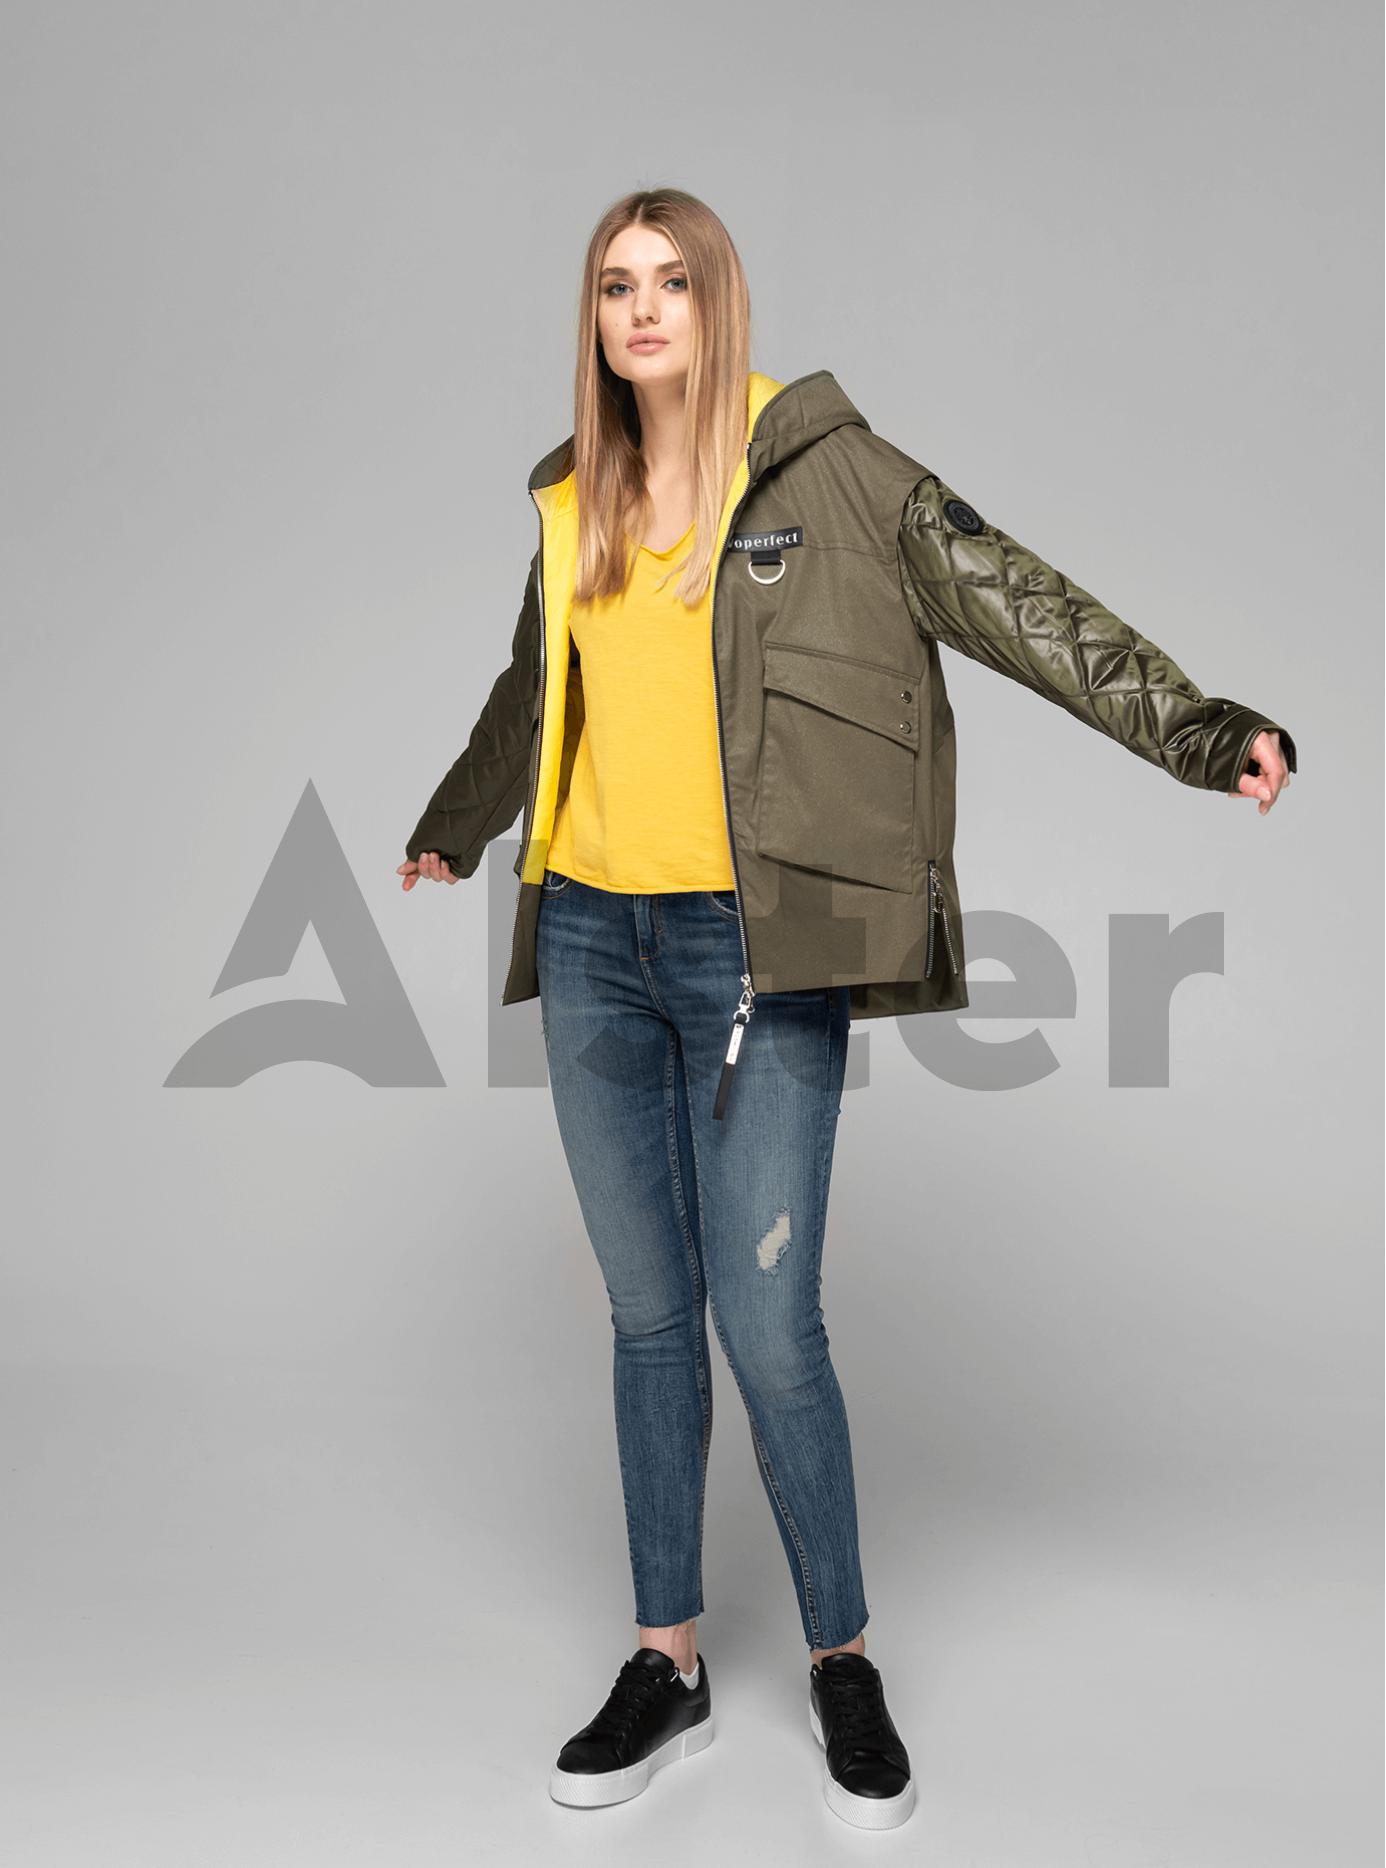 Куртка демисезонная короткая на молнии Хаки S (02-V191058): фото - Alster.ua